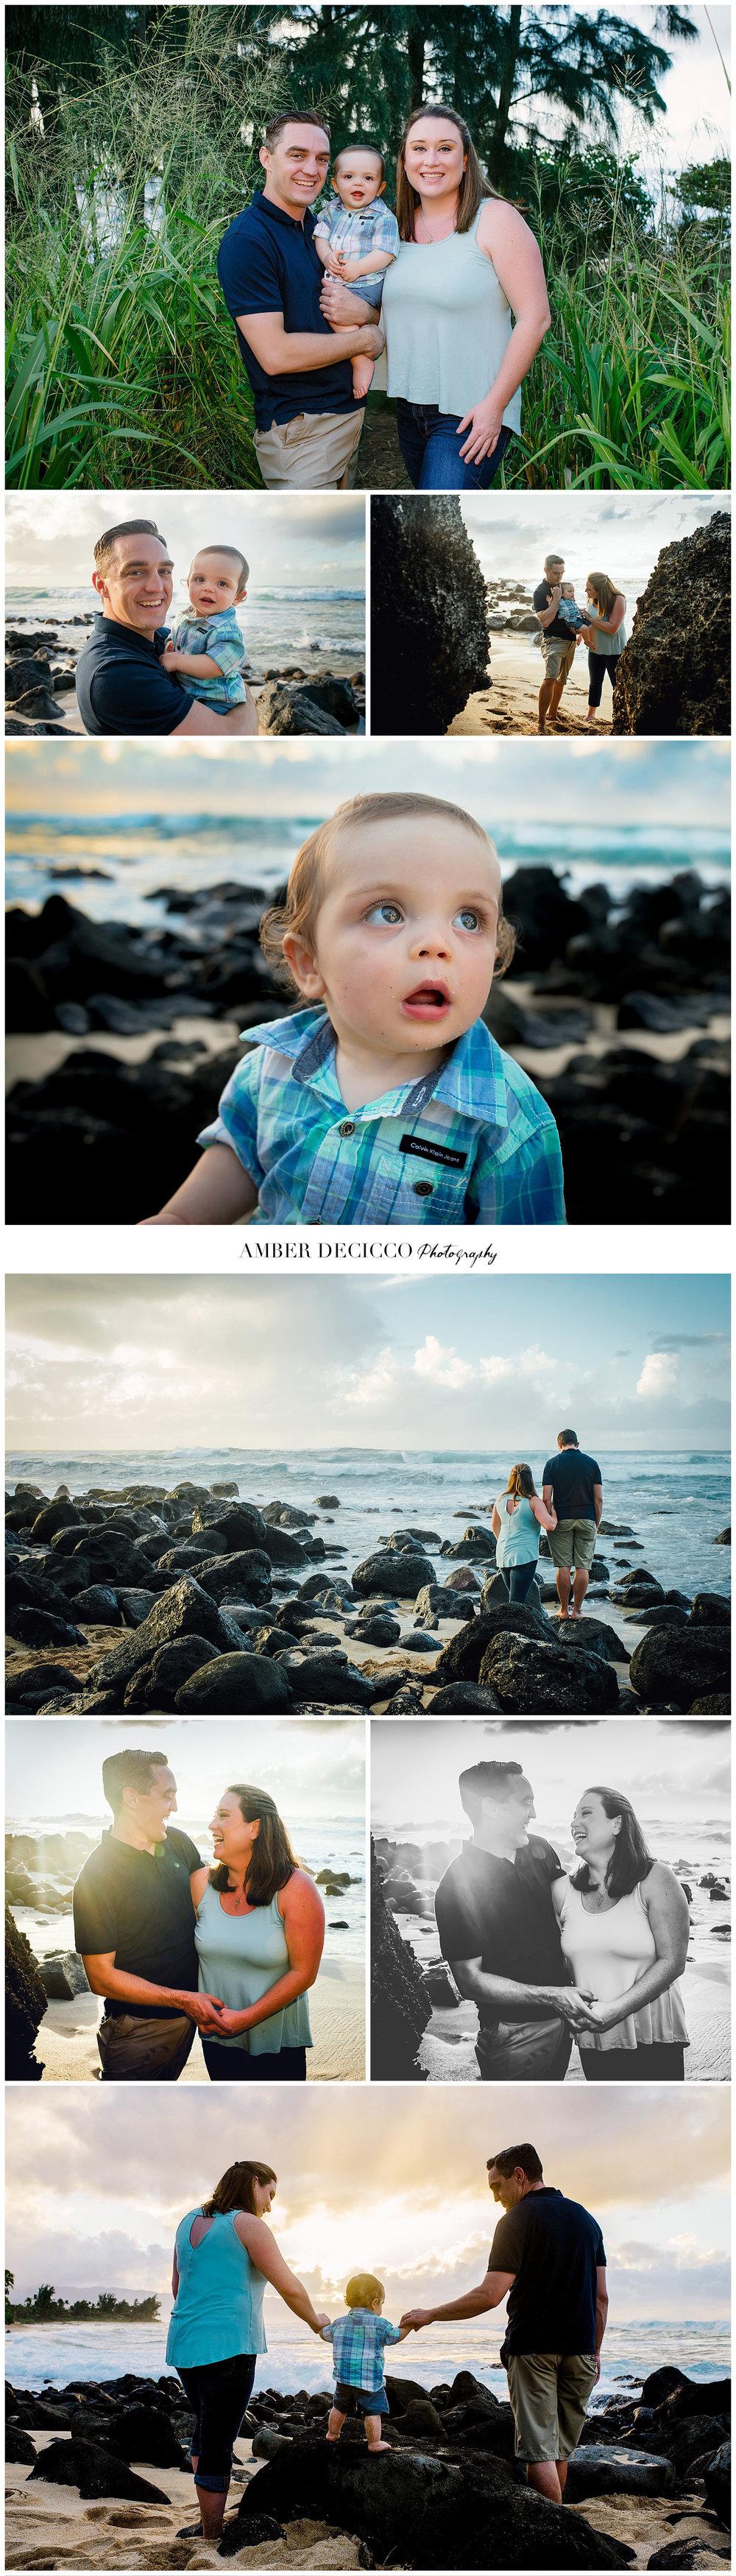 north-shore-family-photographer-amber-decicco